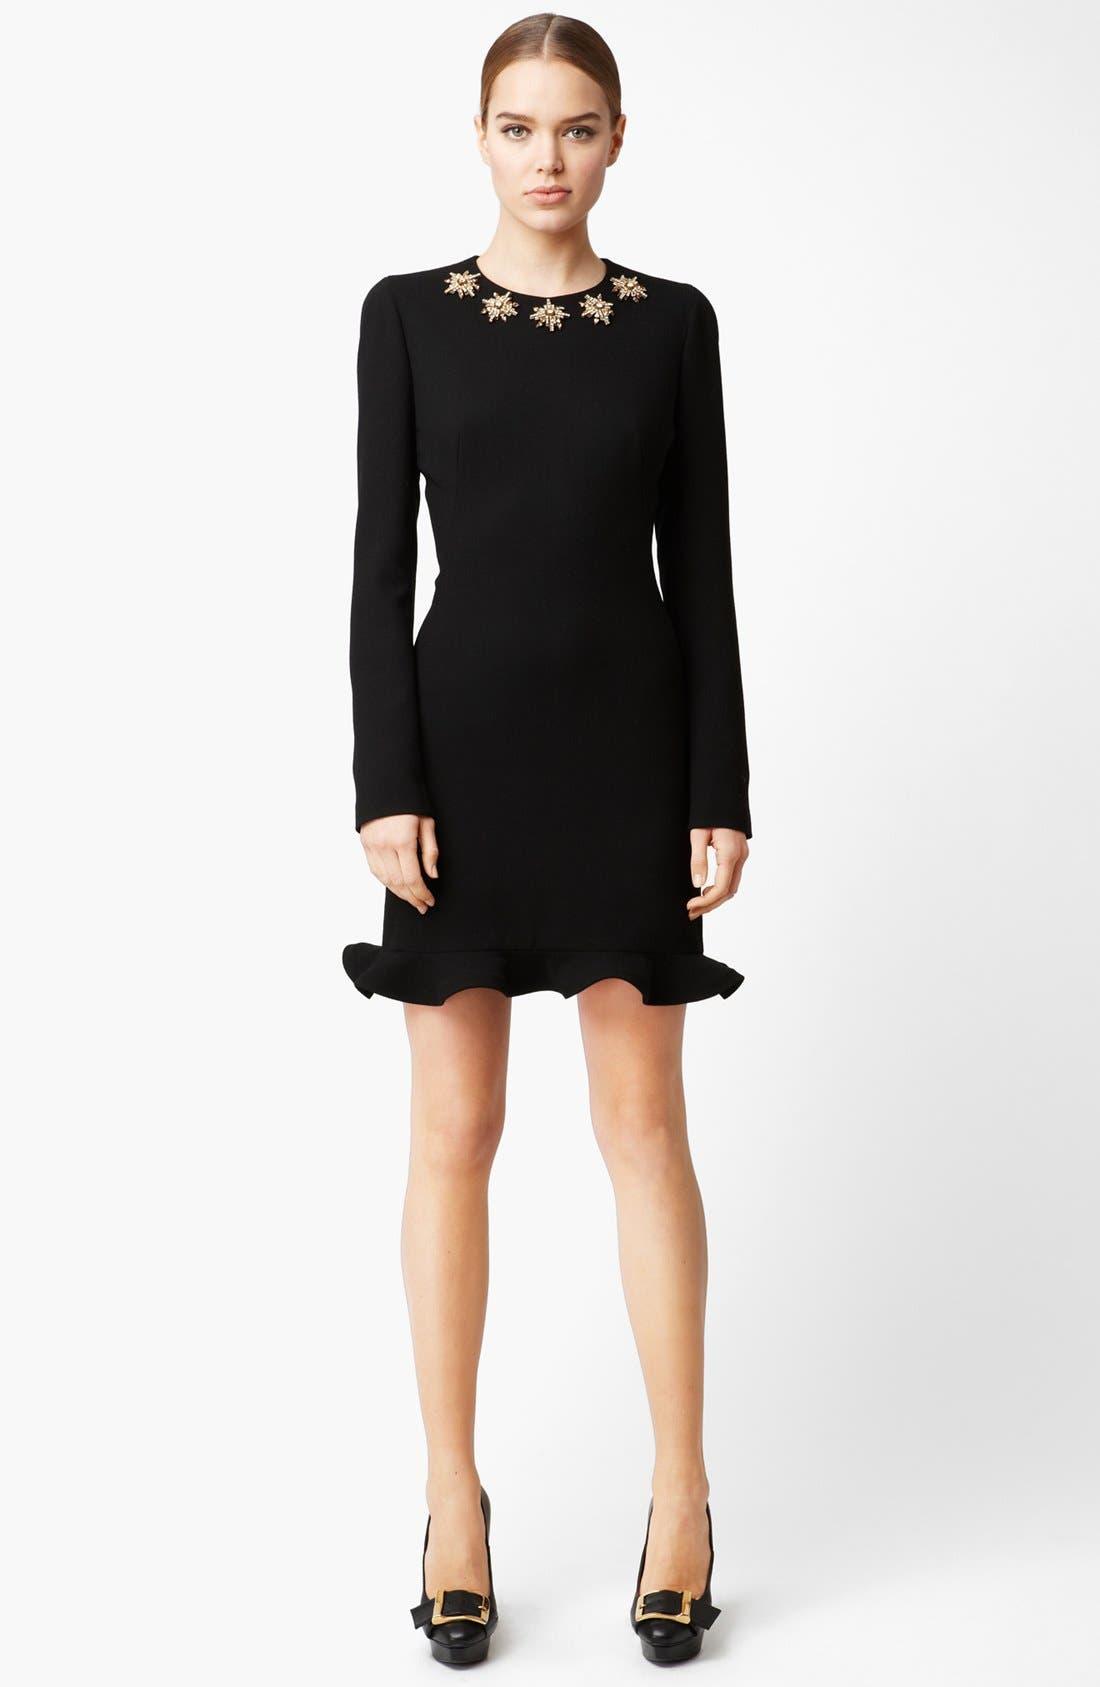 Alternate Image 1 Selected - Alexander McQueen Dress & Accessories